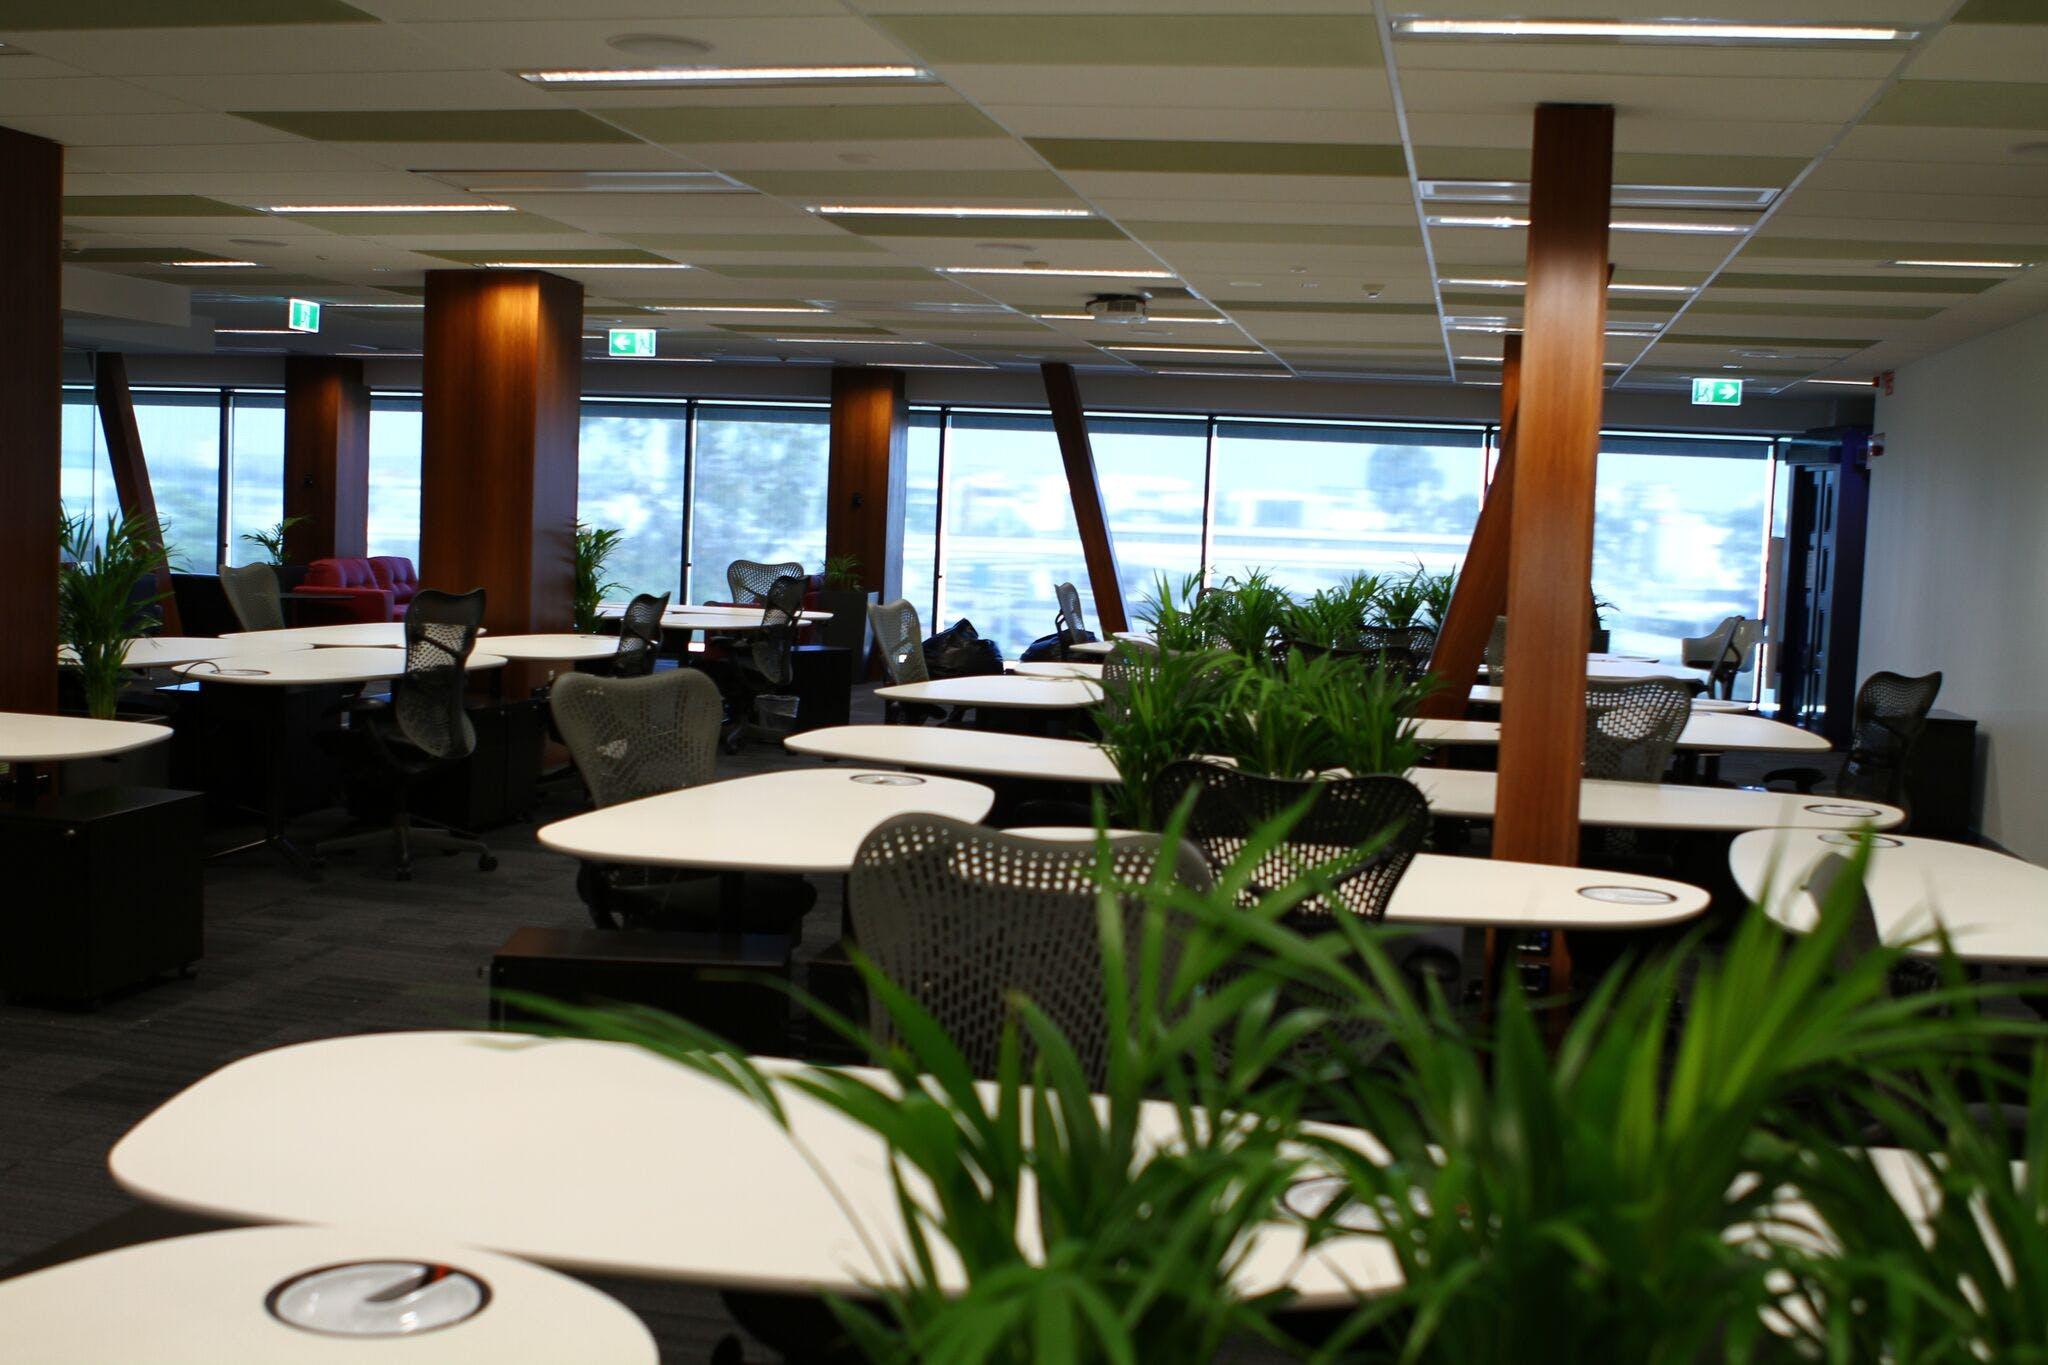 Hot desk at Officenexus, image 5